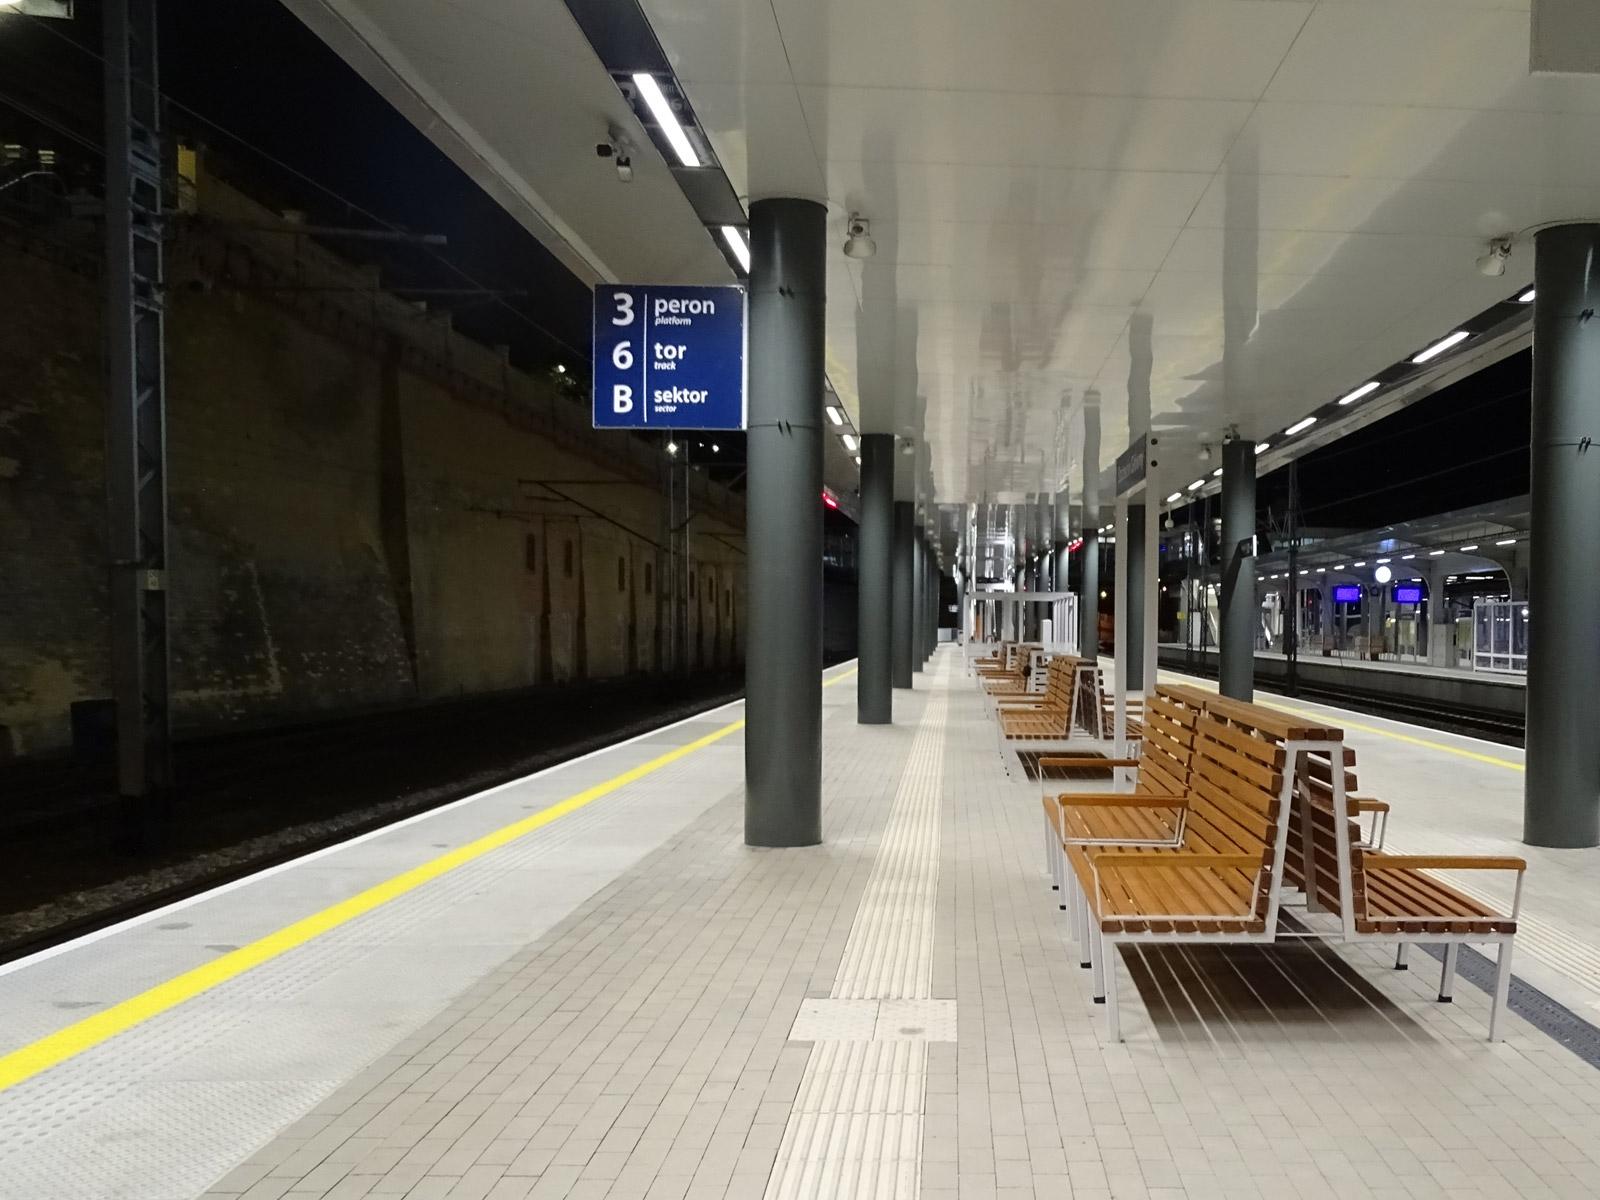 Dworzec_Szczecin-003